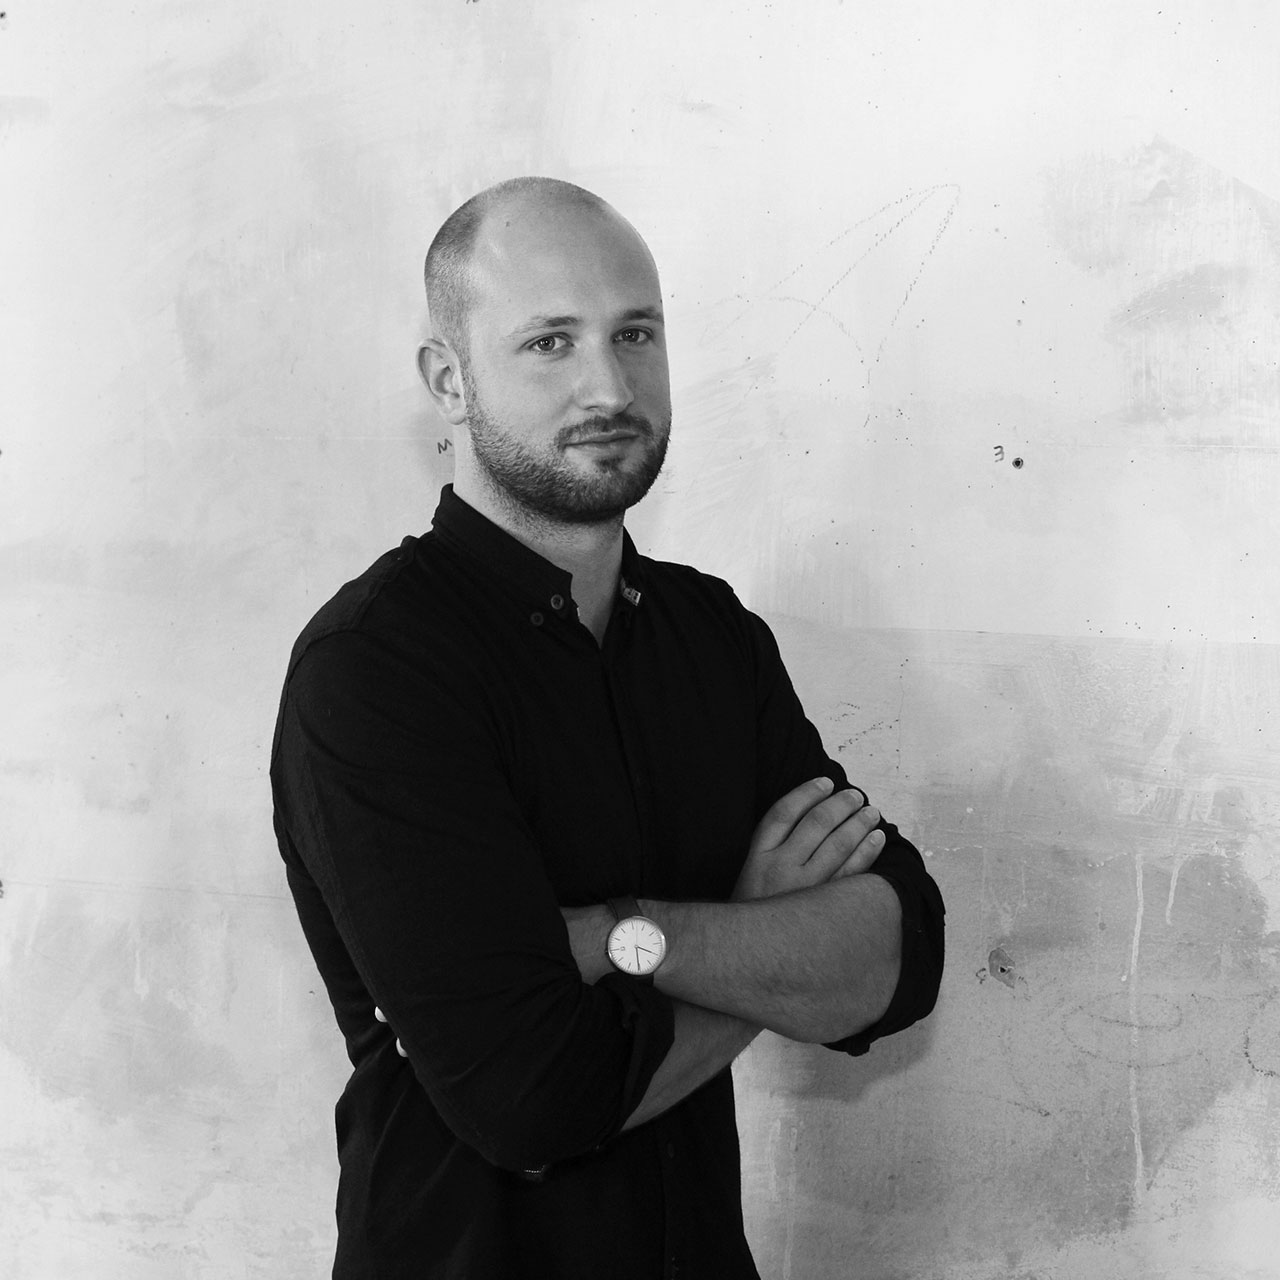 Sebastian Kittelberger (Dipl.-Ing. Architekt), München